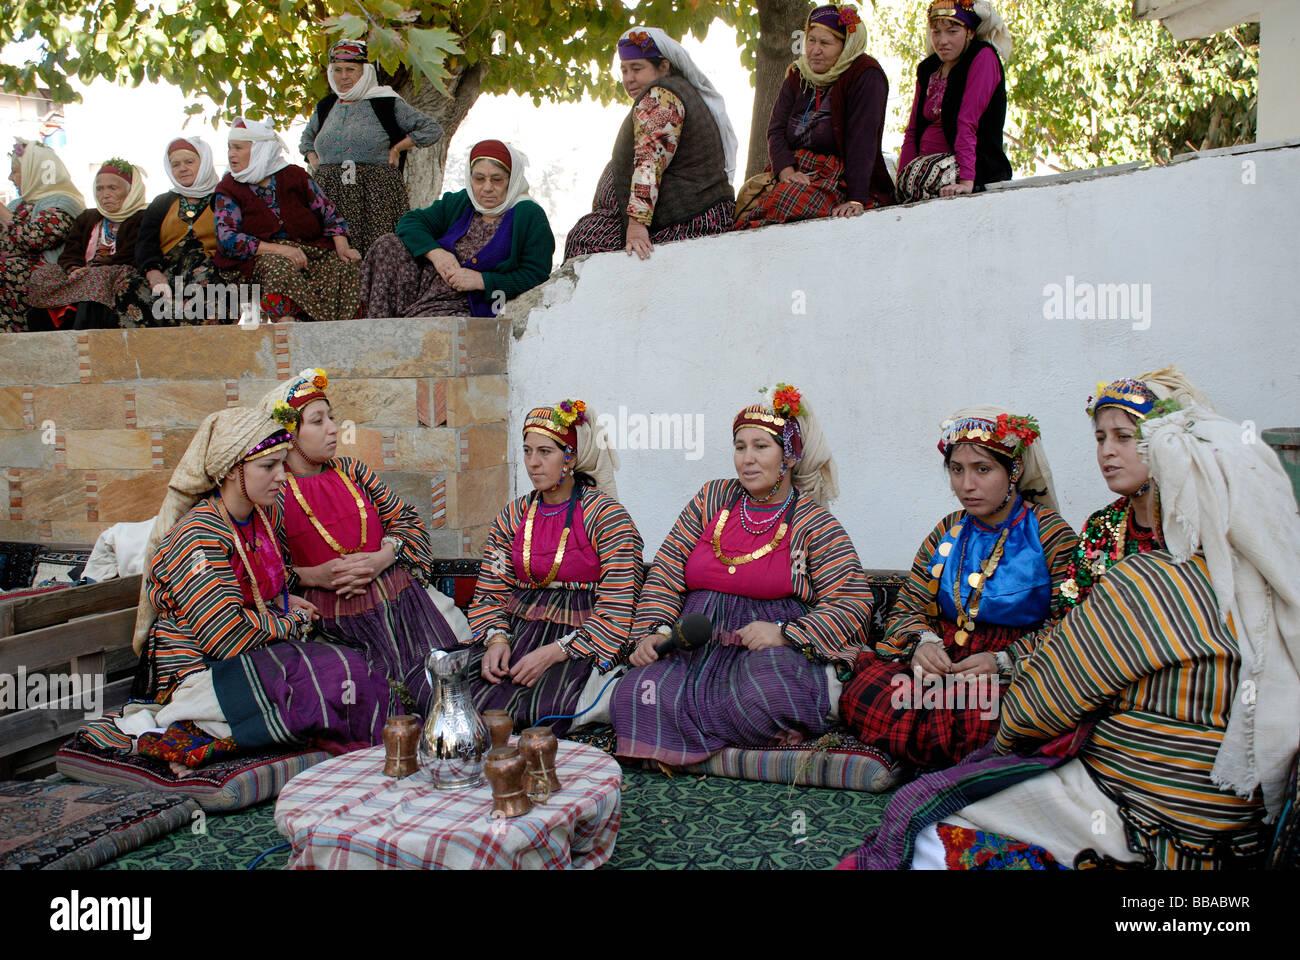 Turkey Traditional Wedding Stockfotos & Turkey Traditional Wedding ...